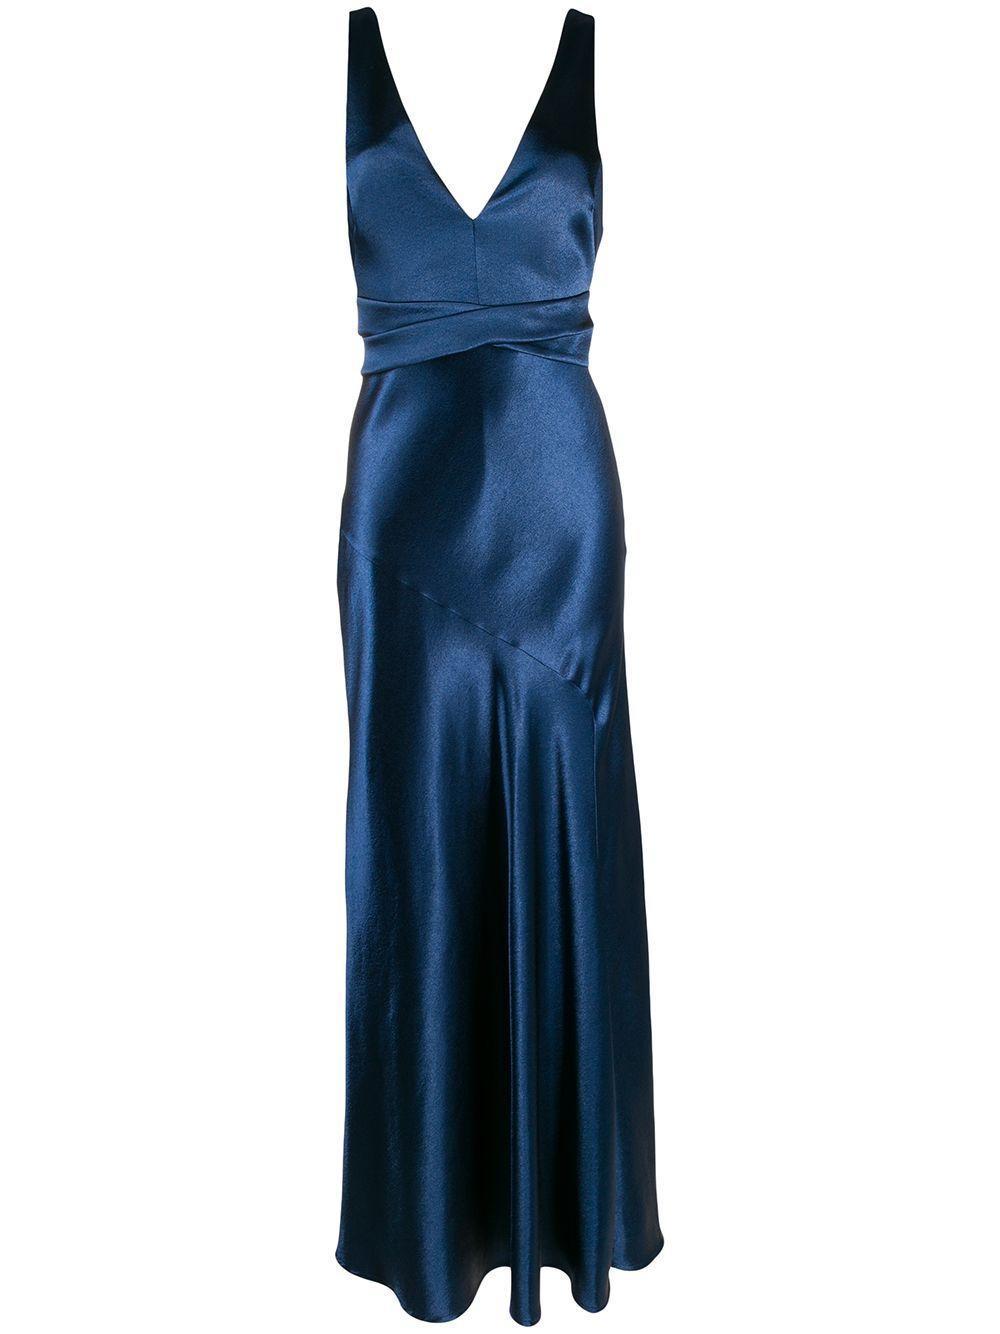 Metallic Bella Dress